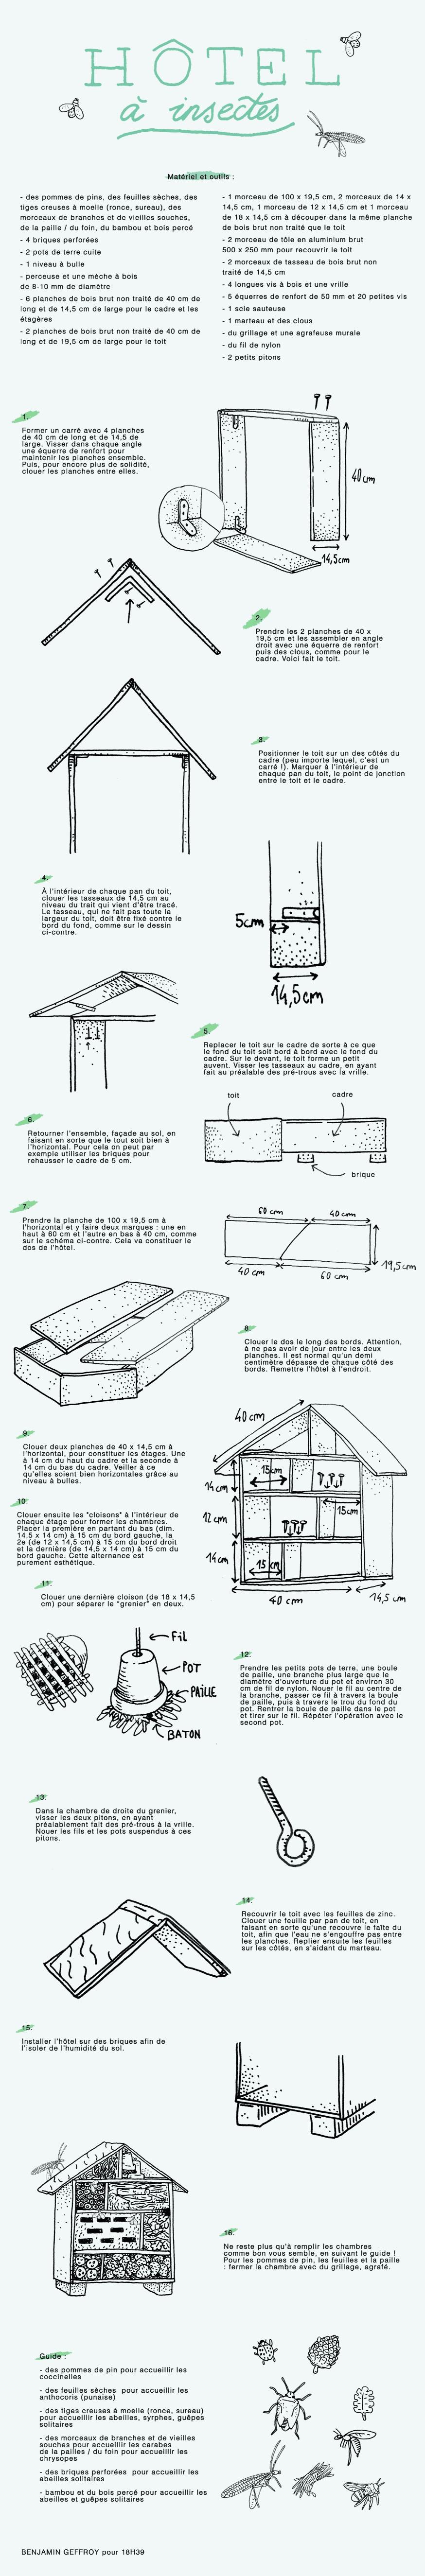 Idee Deco Interieur Cabane En Bois Beau Photos Cabane De Jardin Plan Tmawebsolutions Tmawebsolutions